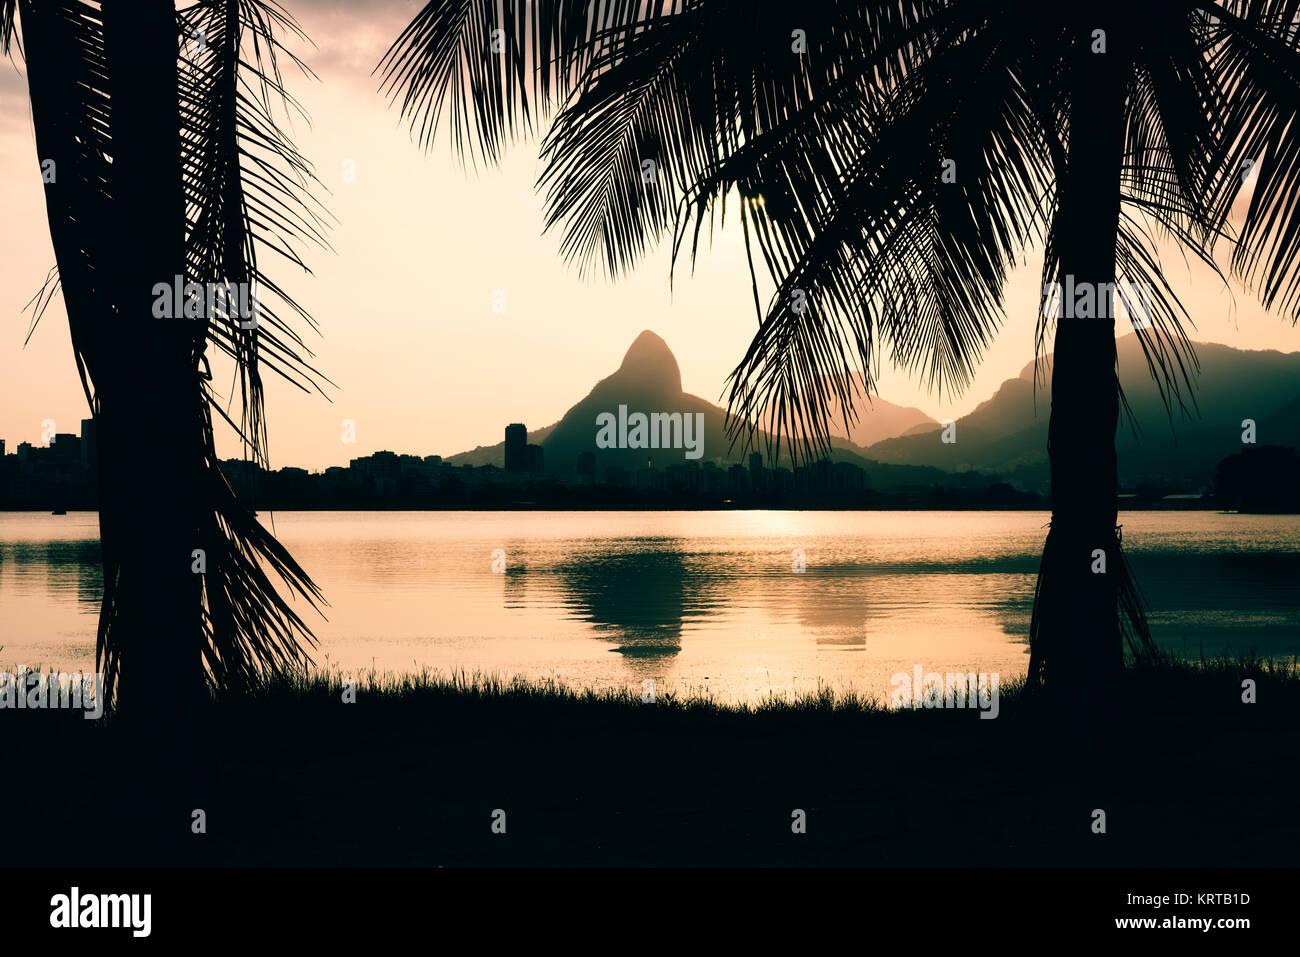 Morro Dois Irmaoes visto desde la Lagoa Rodrigo de Freitas al atardecer en Río de Janeiro, Brasil Imagen De Stock